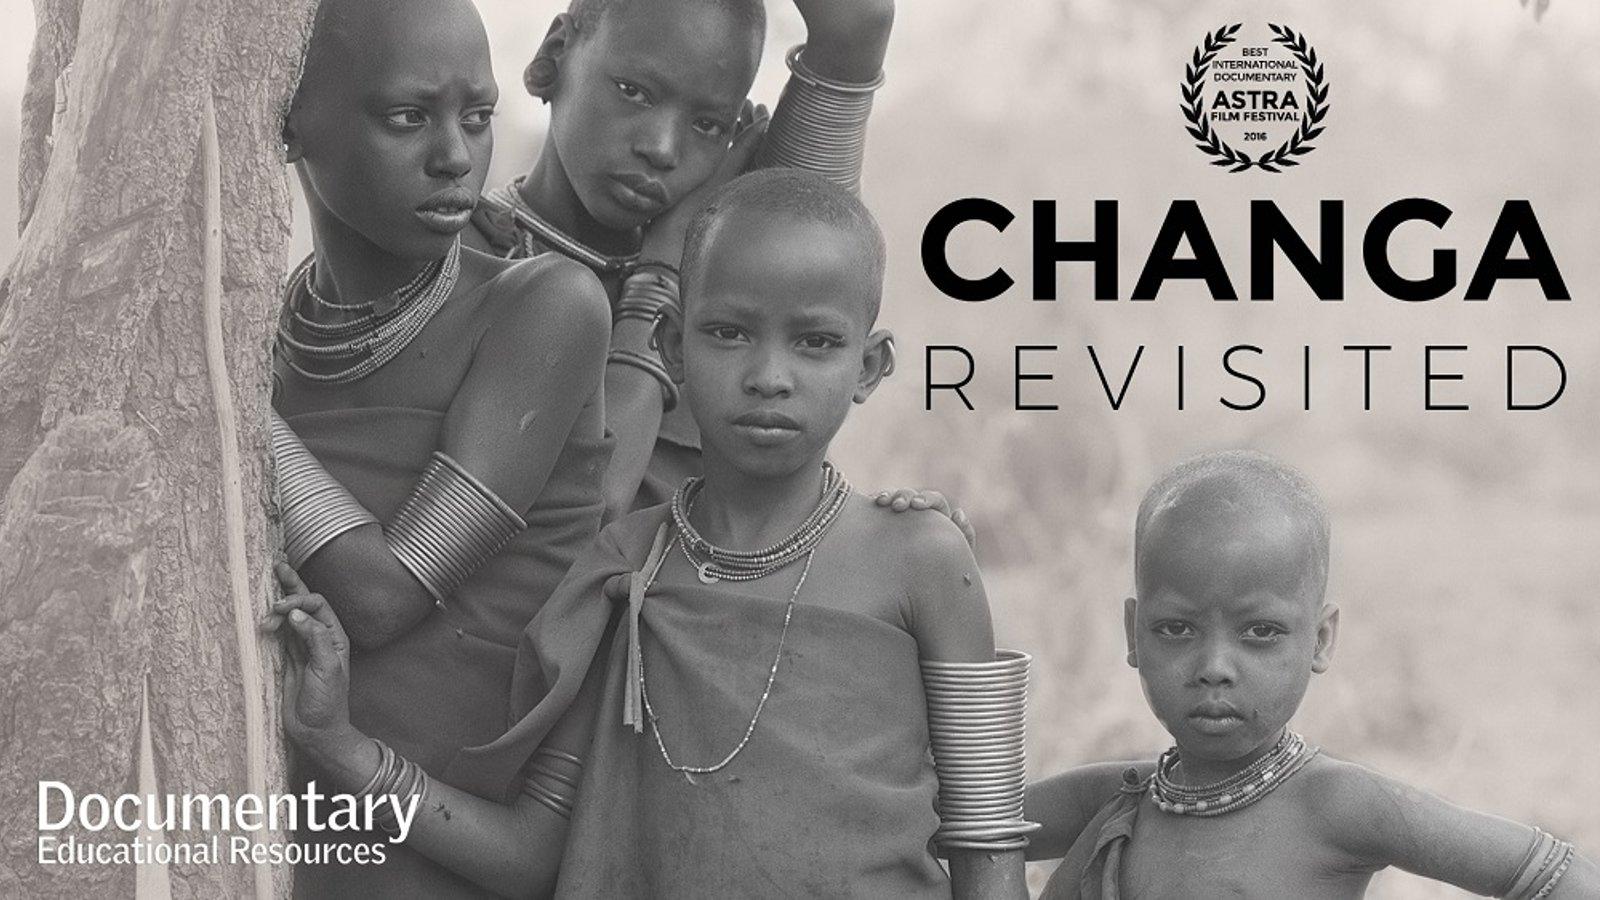 Changa Revisited - Social and Economic Change Among Maasai Pastoralists in Tanzania